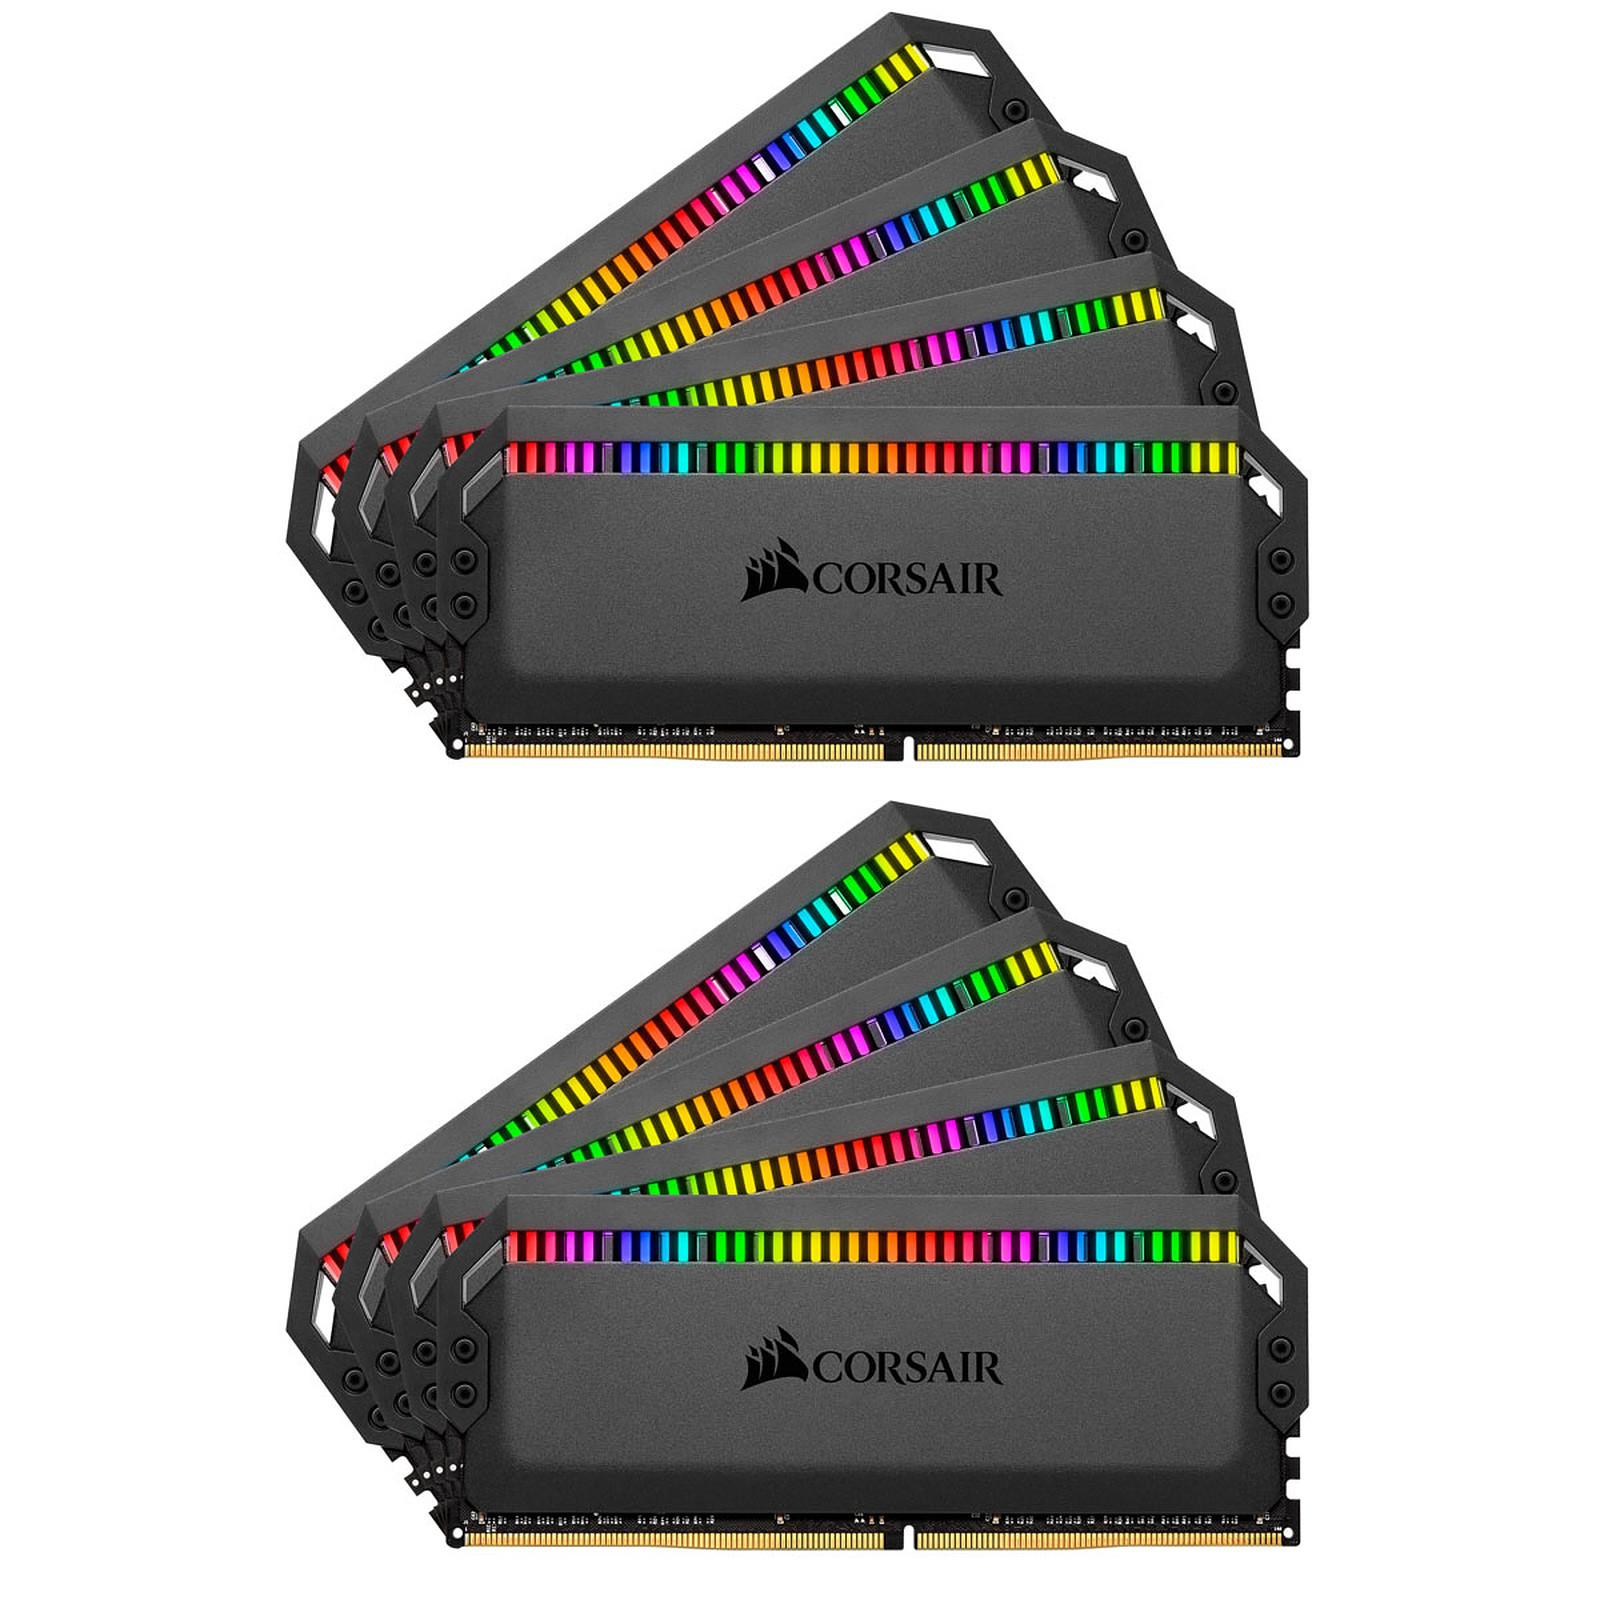 Corsair Dominator Platinum RGB 64 Go (8x 8Go) DDR4 3600 MHz CL16